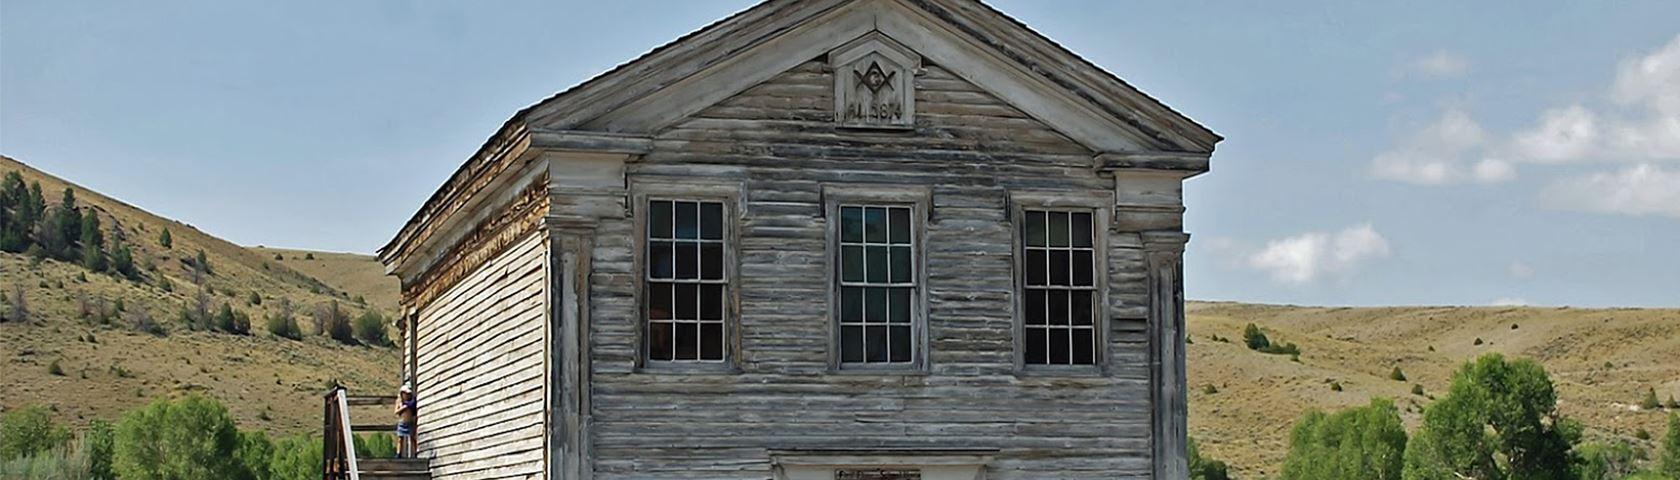 Freemason's Hall 2